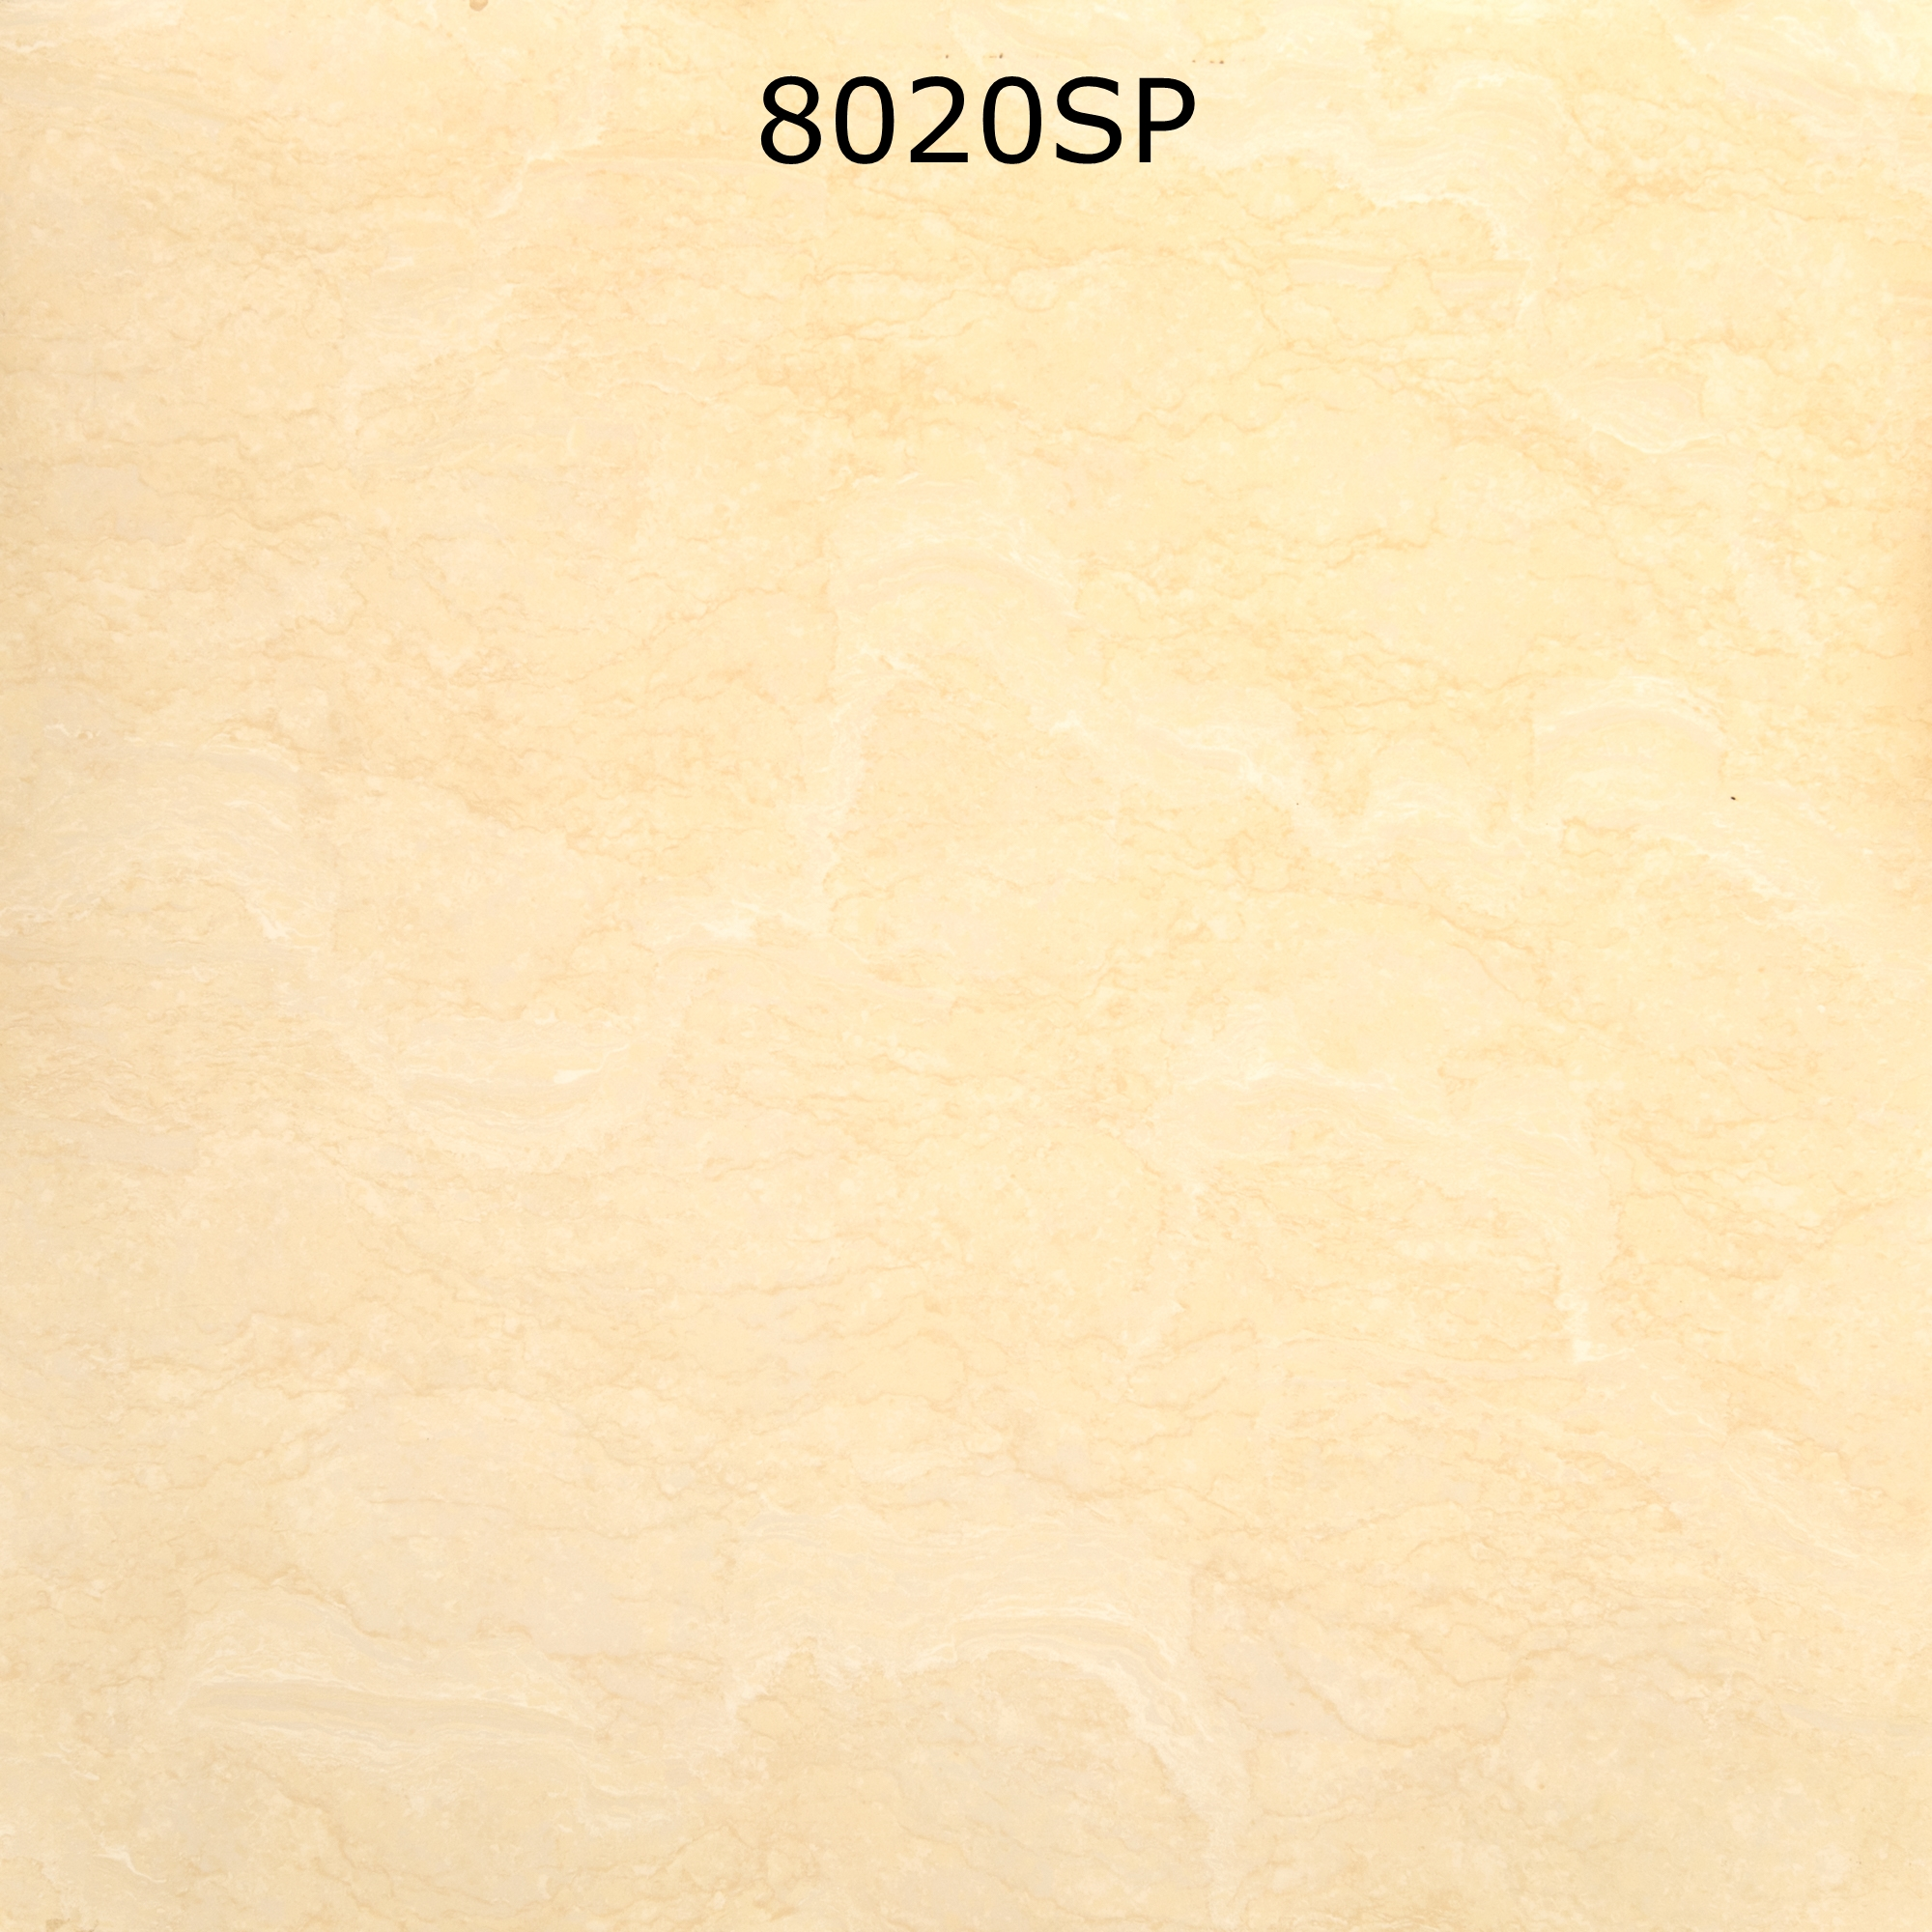 8020SP